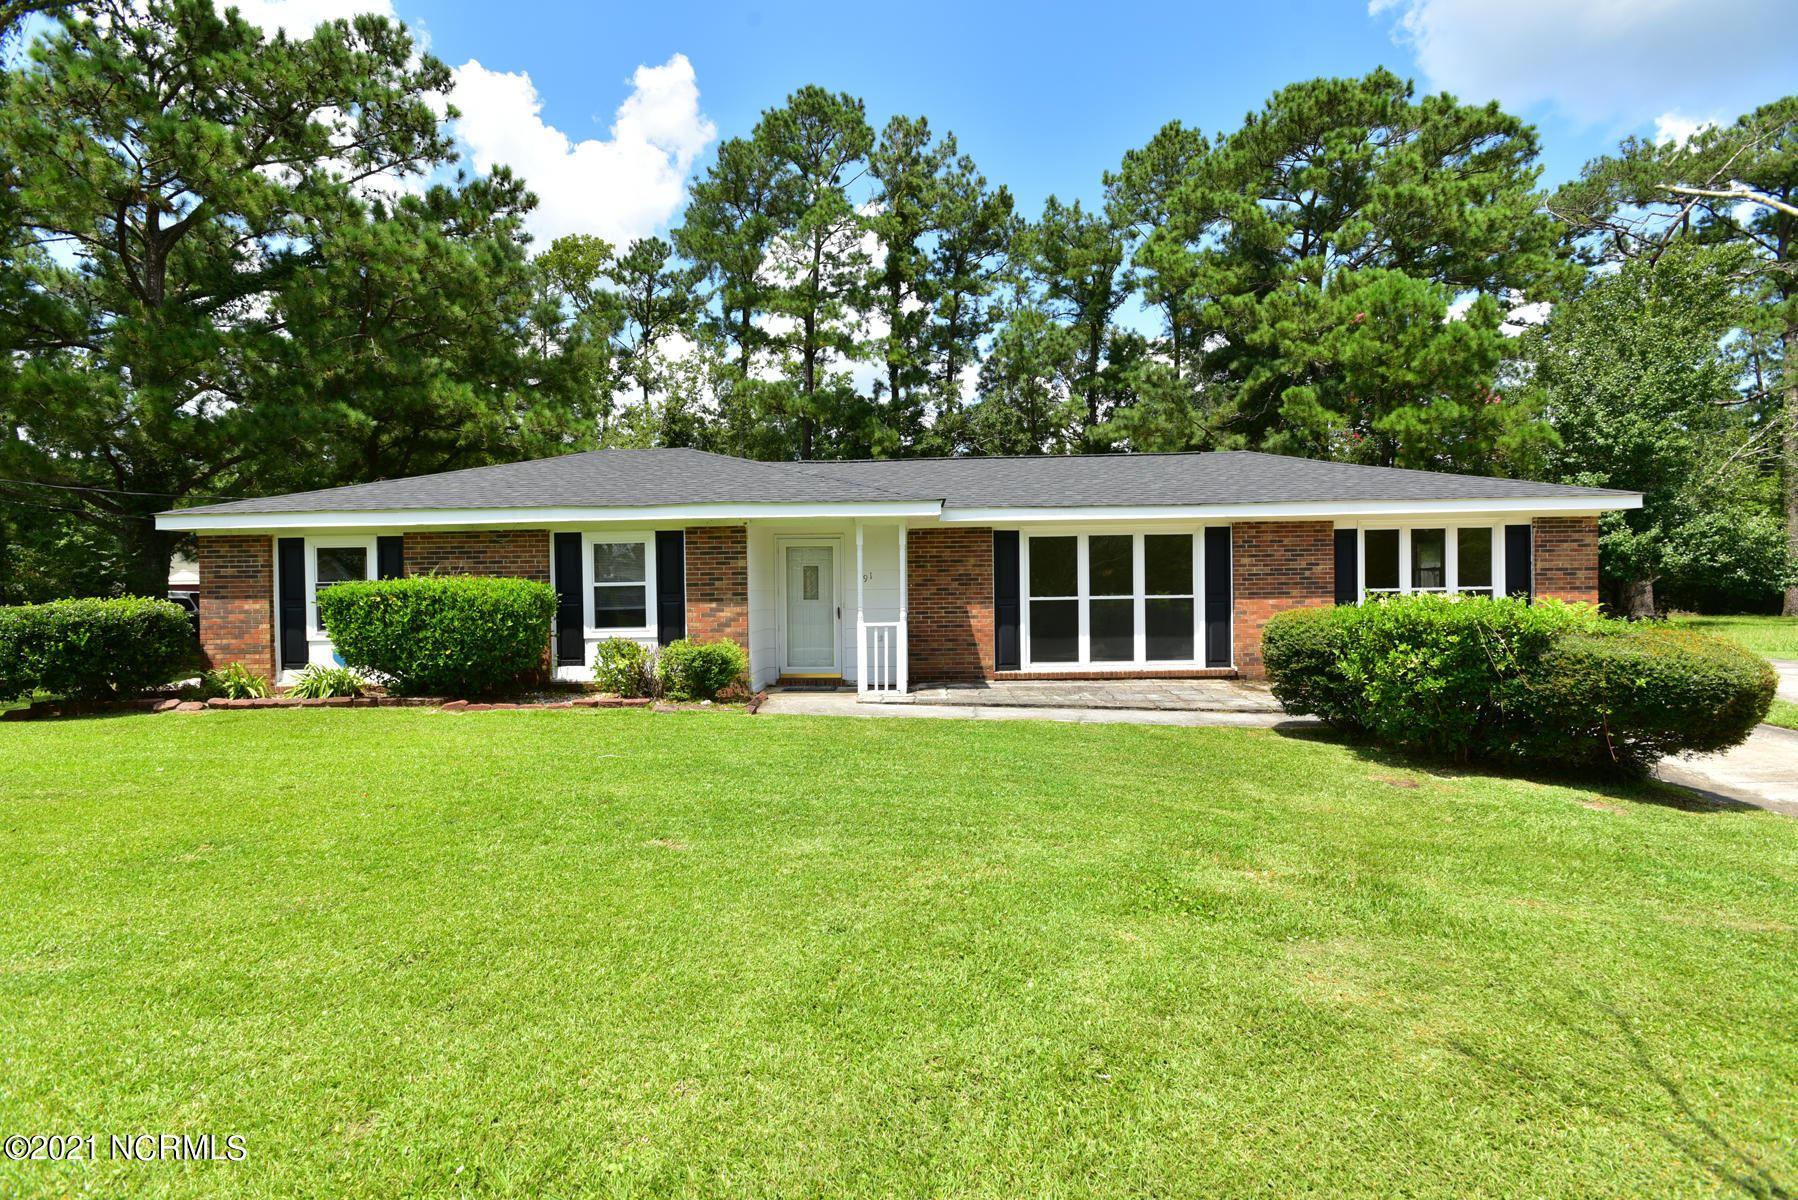 Photo of 91 Vandergrift Drive, Jacksonville, NC 28540 (MLS # 100286396)